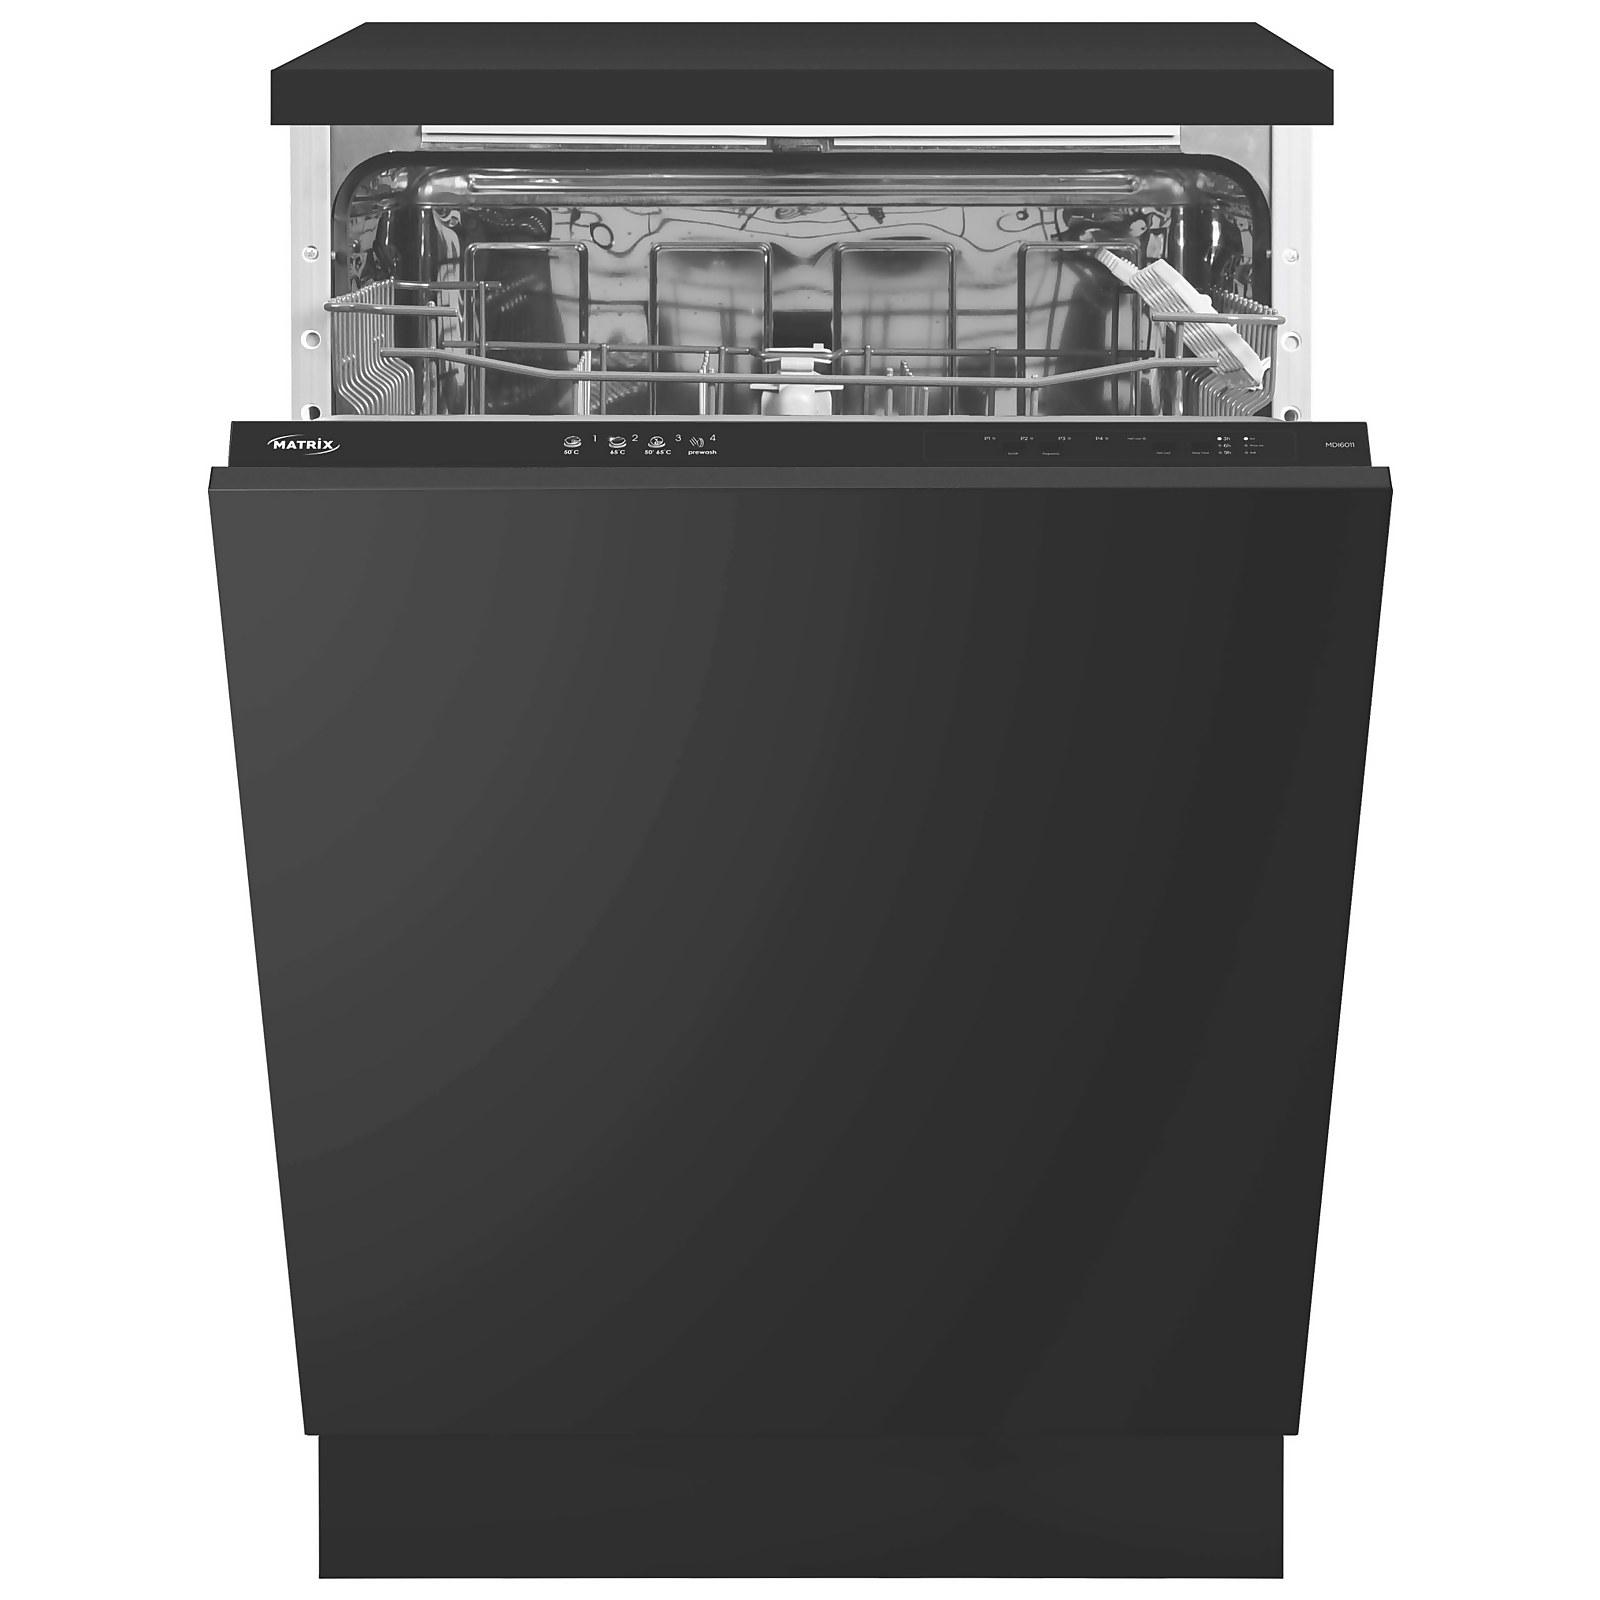 Matrix MDI6011 Integrated Dishwasher - 60cm